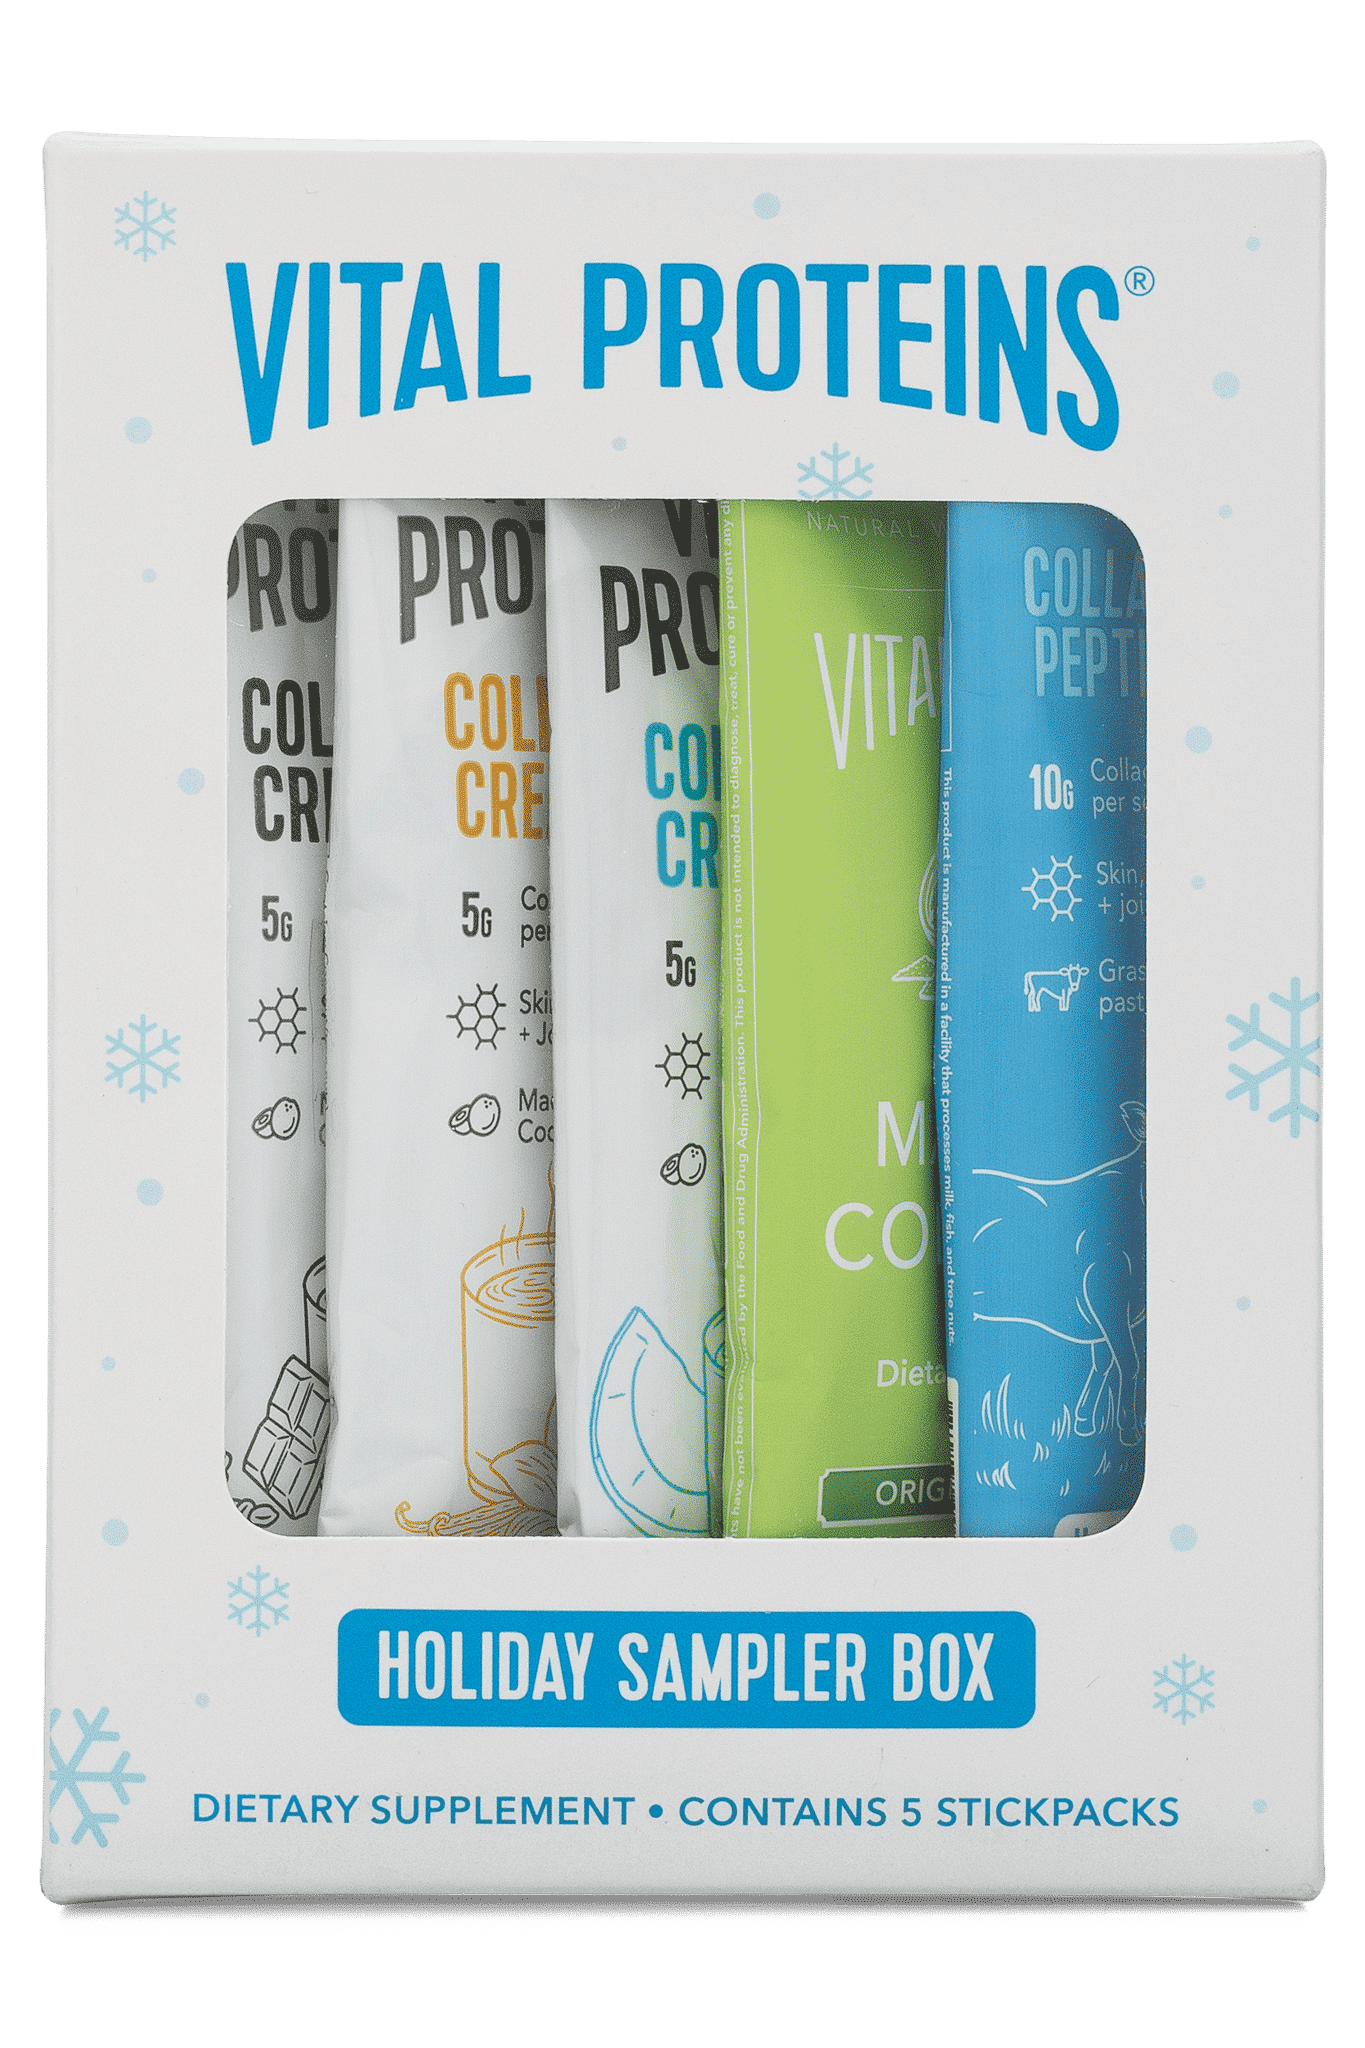 vital proteins holiday sampler box with collagen creamer, vanilla collagen creamer, coconut collagen creamer, collagen matcha, and collagen peptides